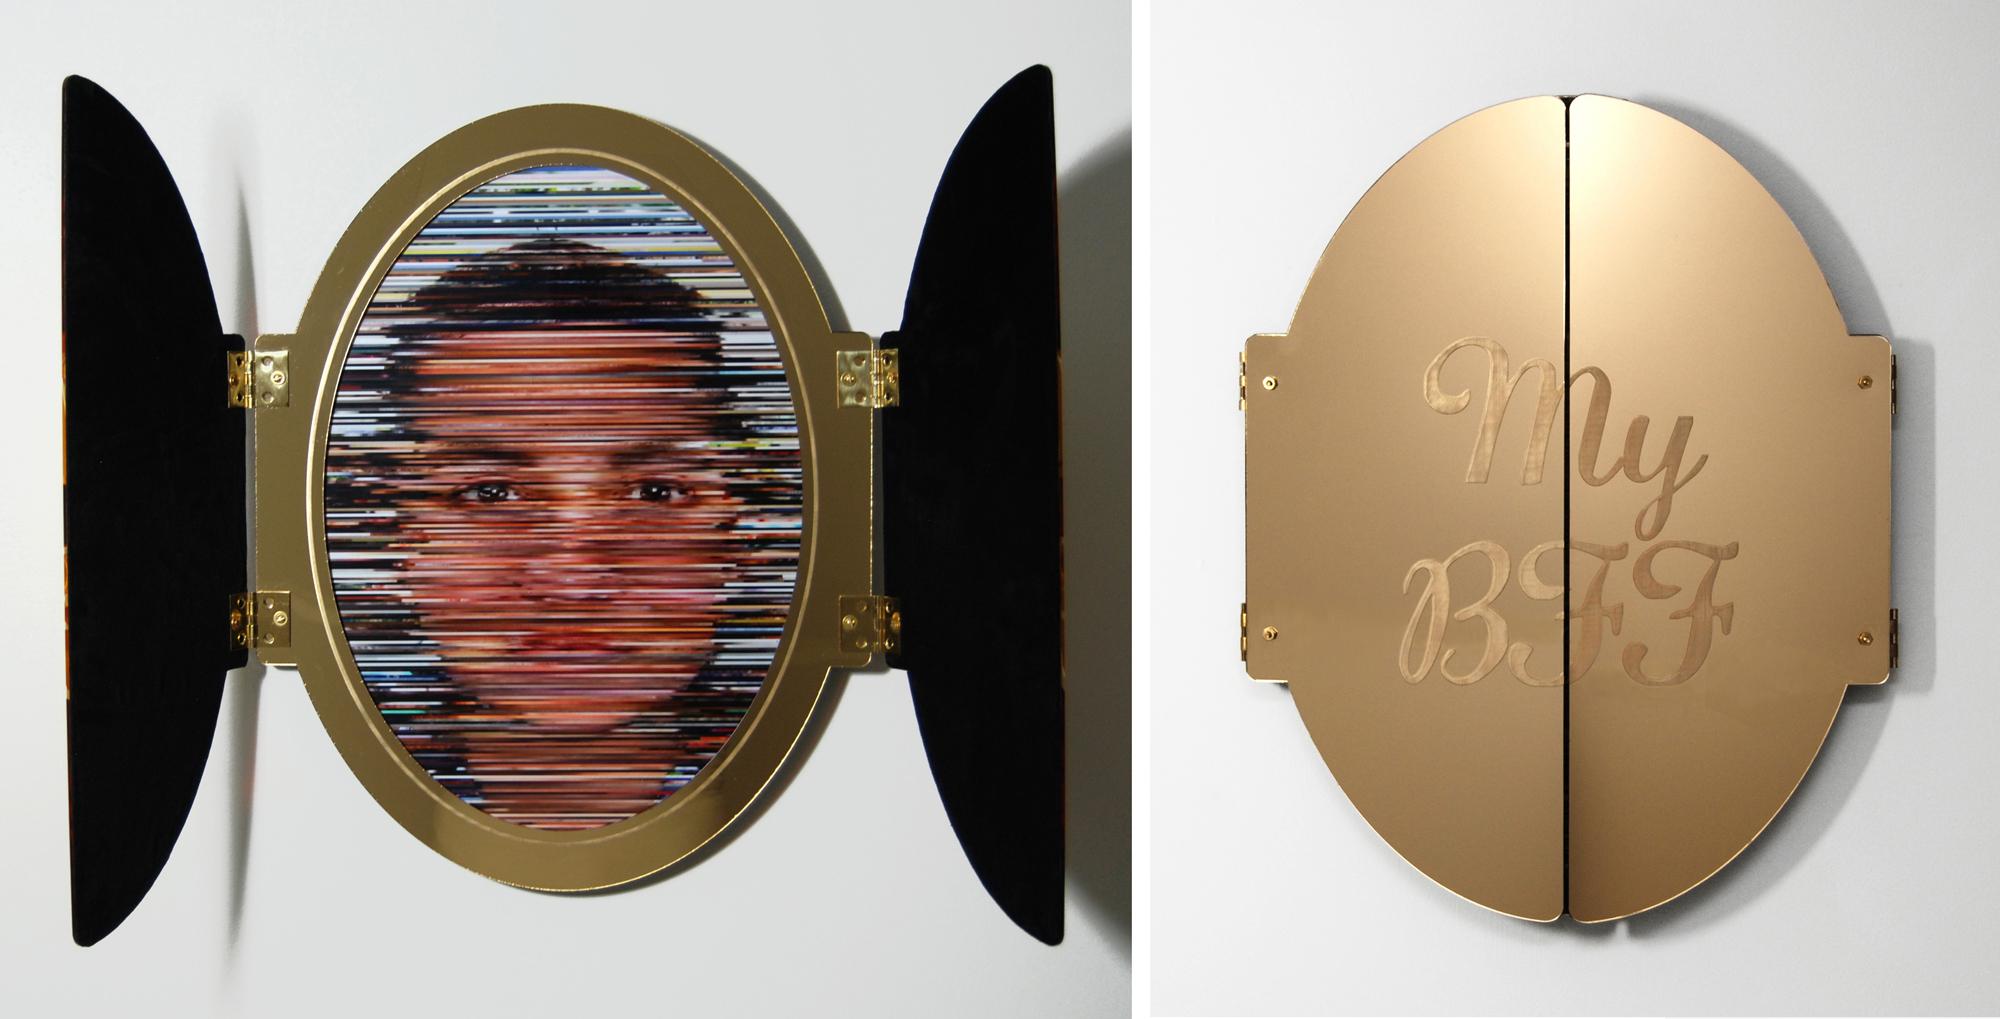 My FB BFF , inkjet print, velvet, gold mirrored plexiglass, 22 x 33 x 2 inches, 2017